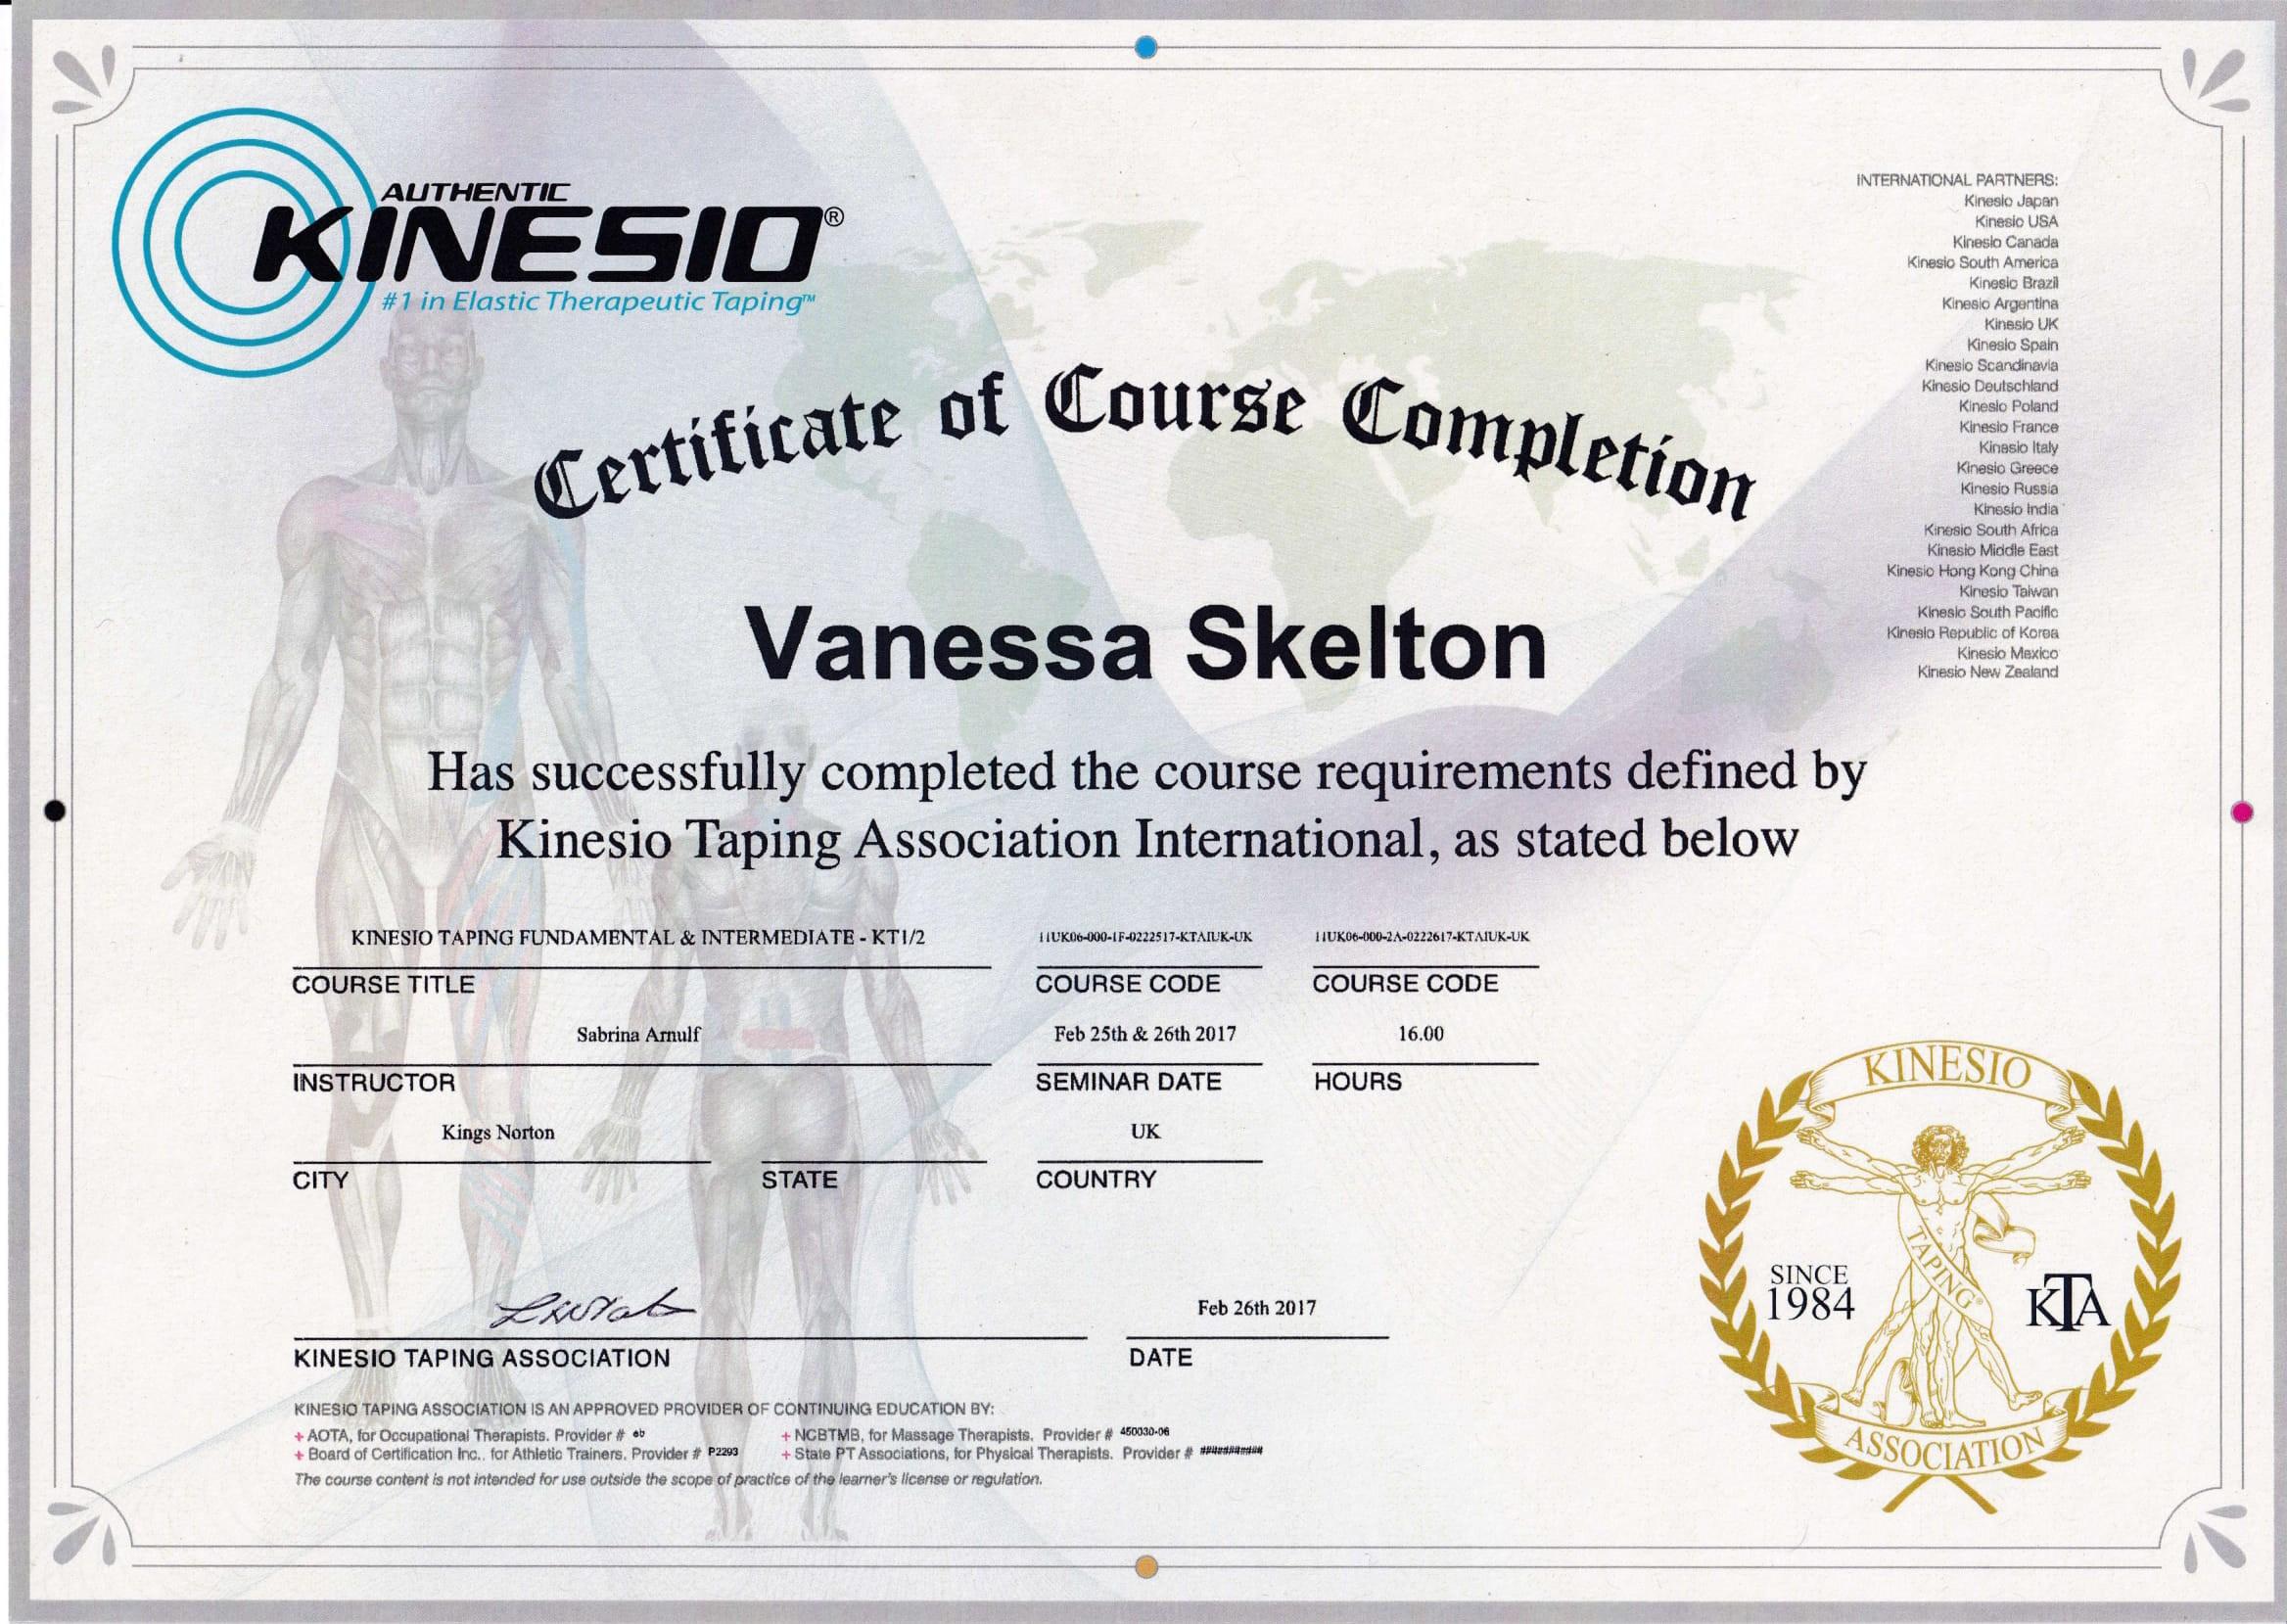 kinesio taping certificate 26.2.17-1.jpg